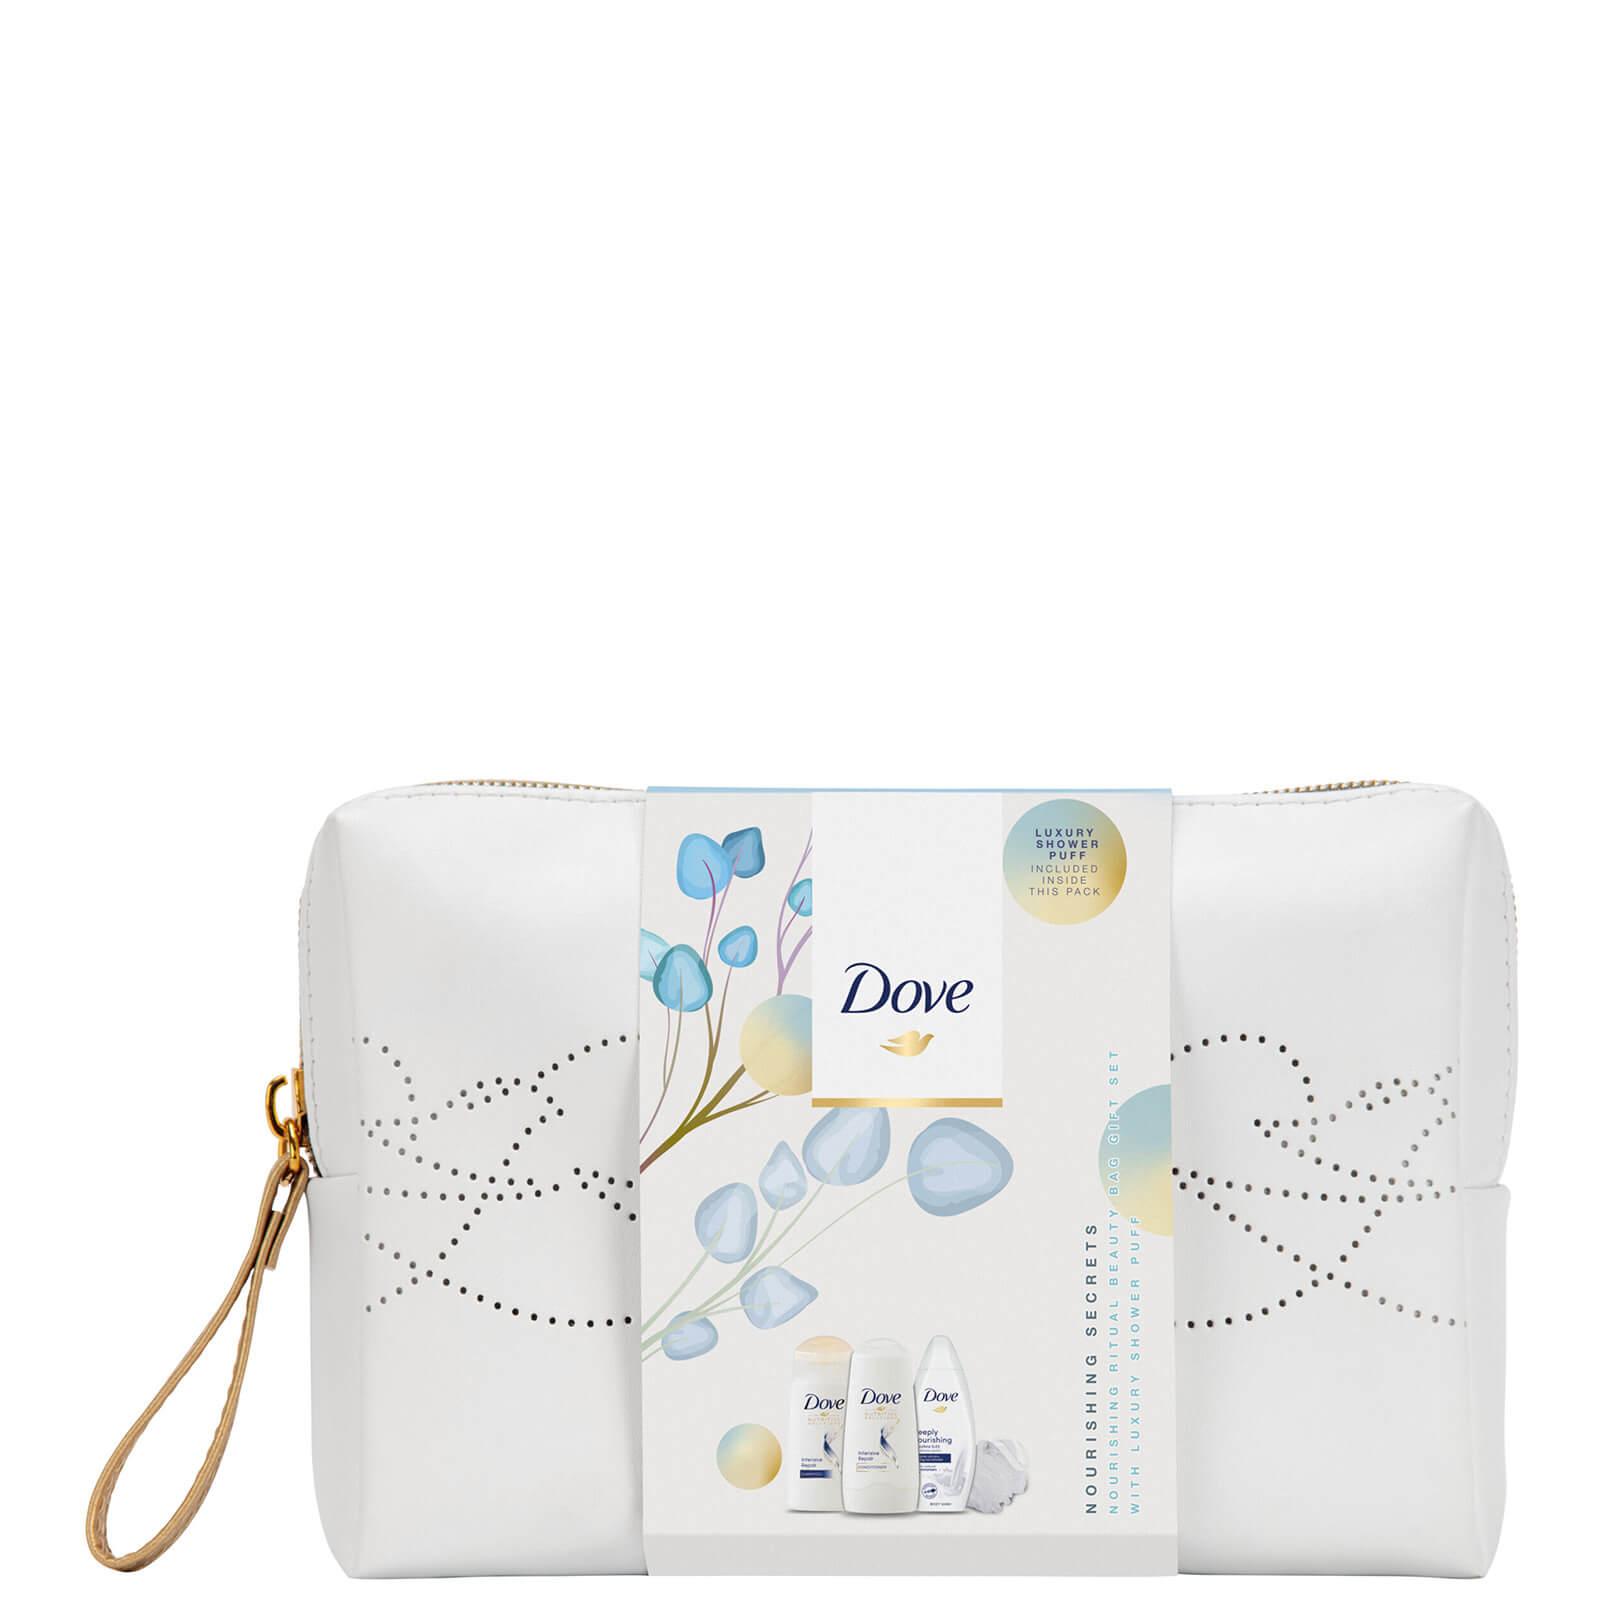 Купить Dove Nourishing Secrets Nourishing Rituals Beauty Bag Gift